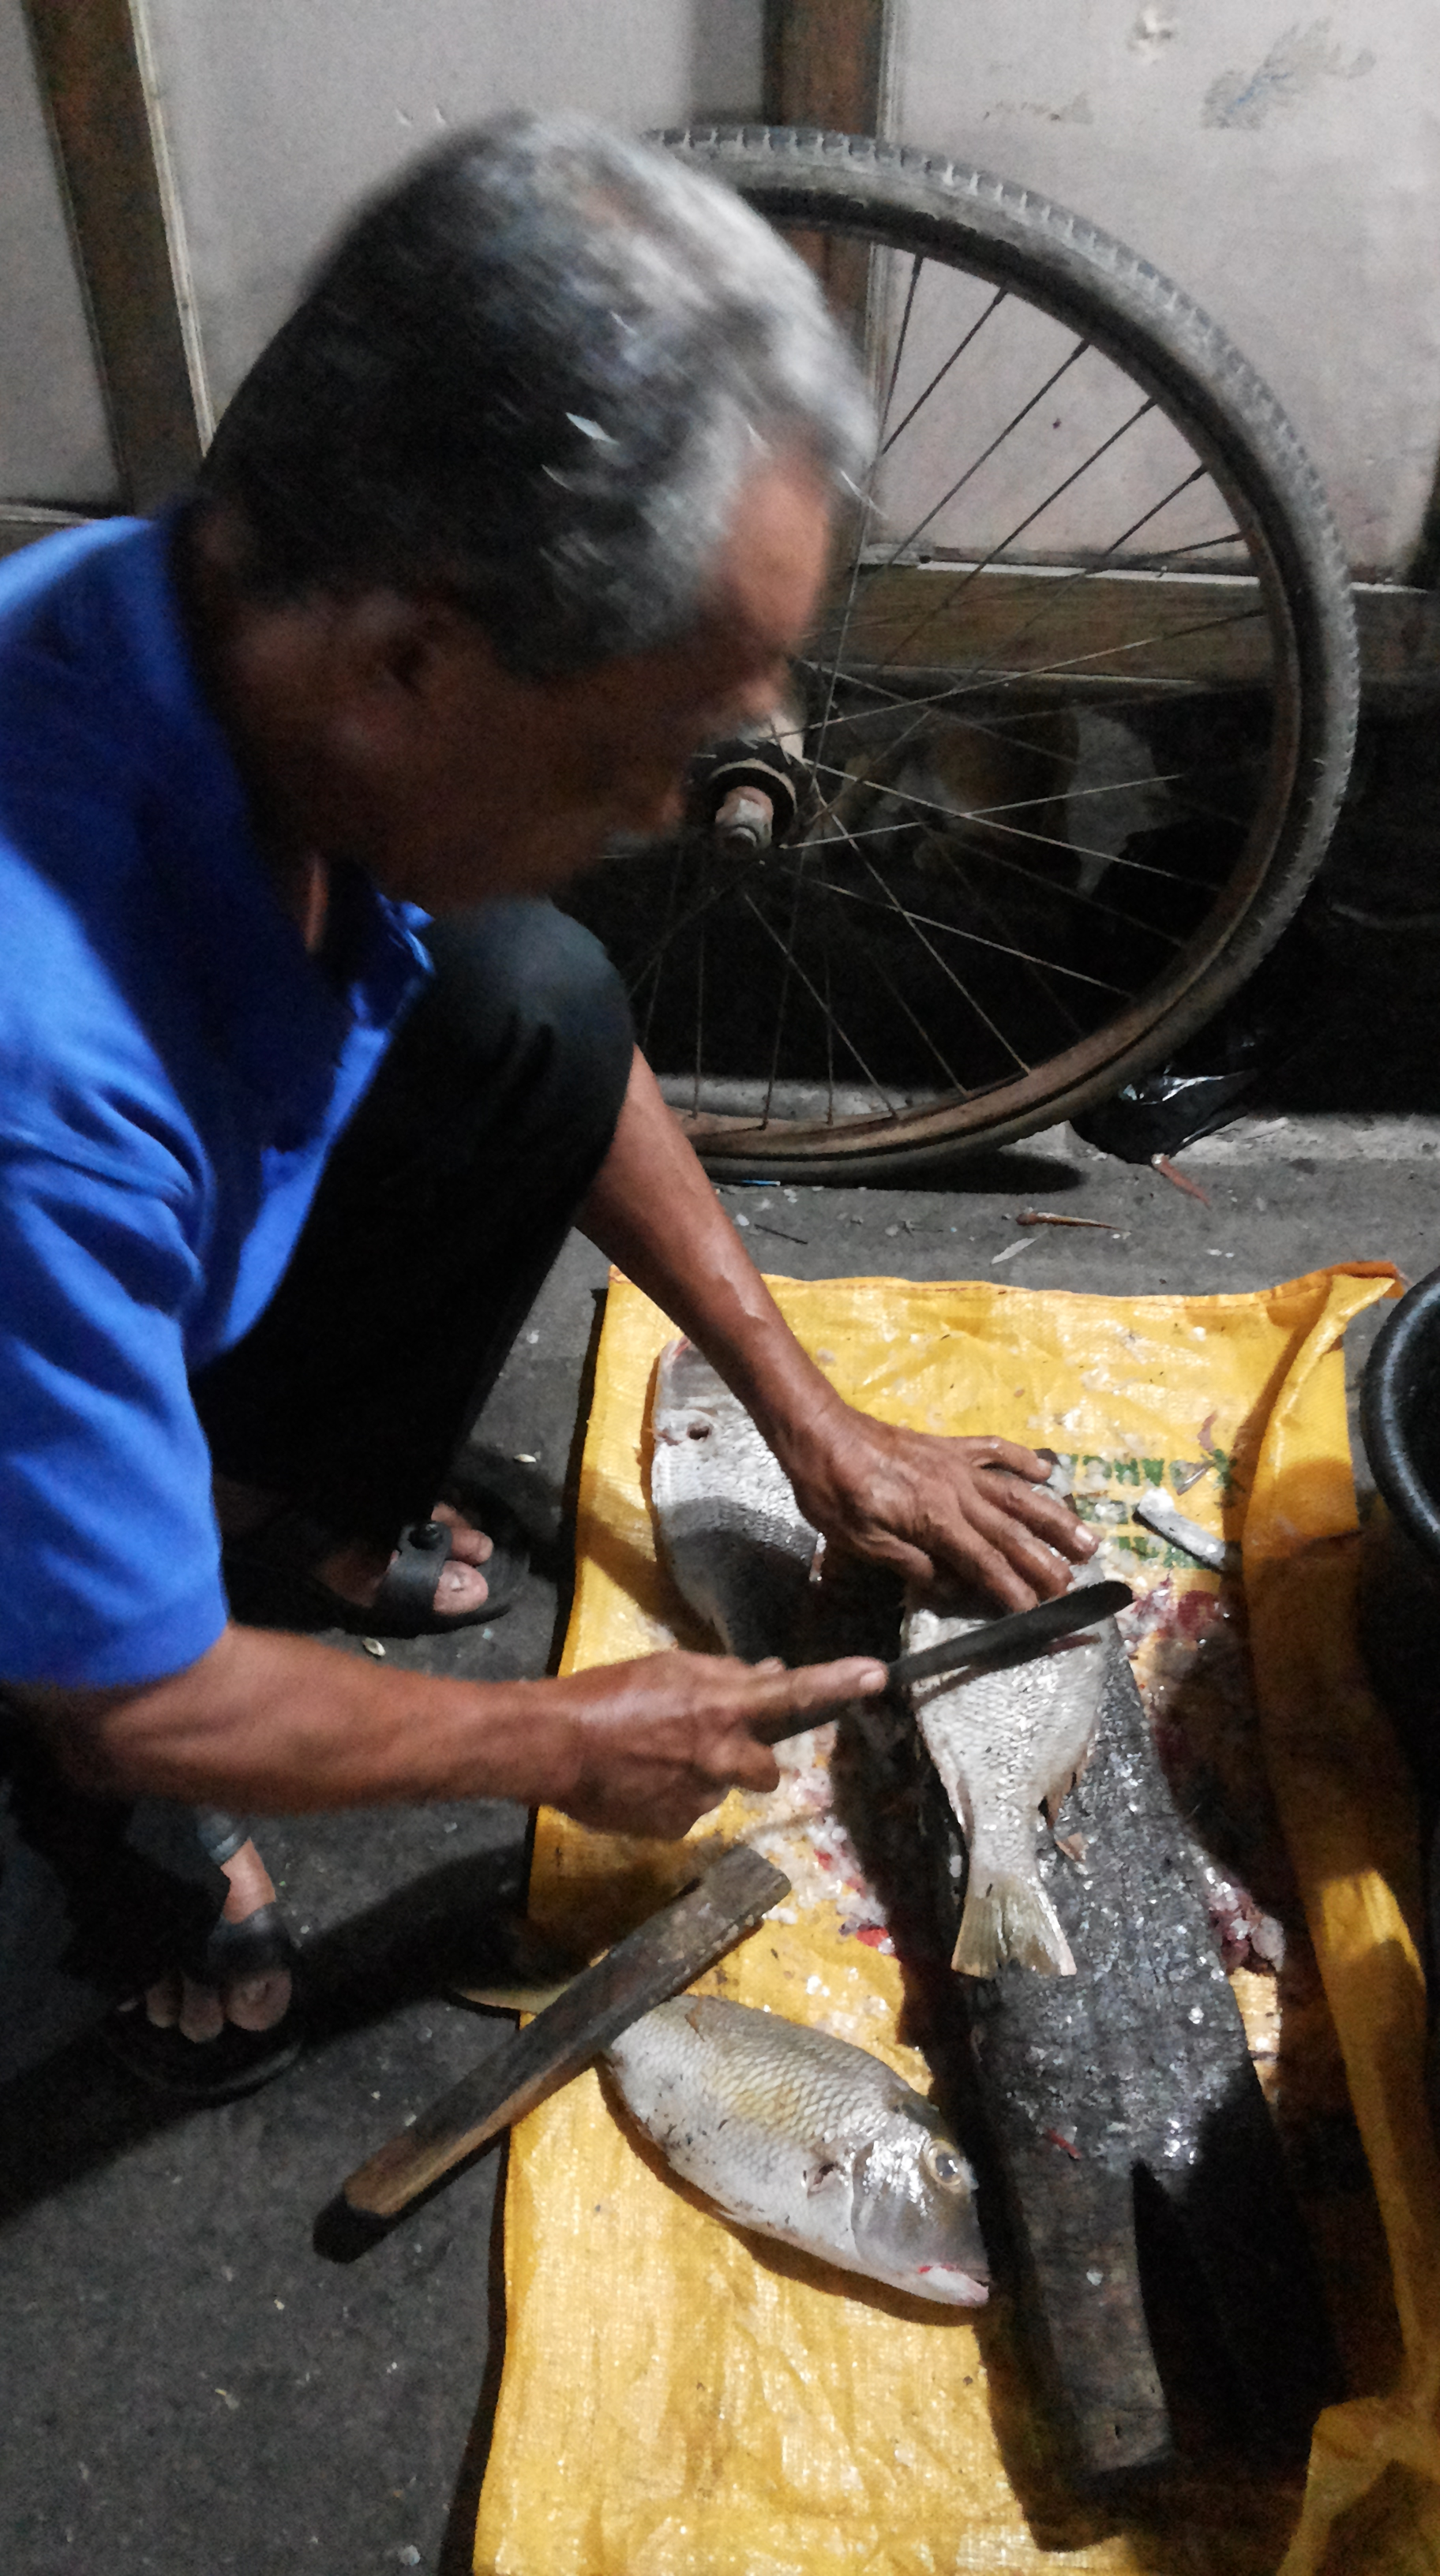 Kuliner Pasar Malam Kota Kupang Rasa Jawa Kita Membersihkan Ikan